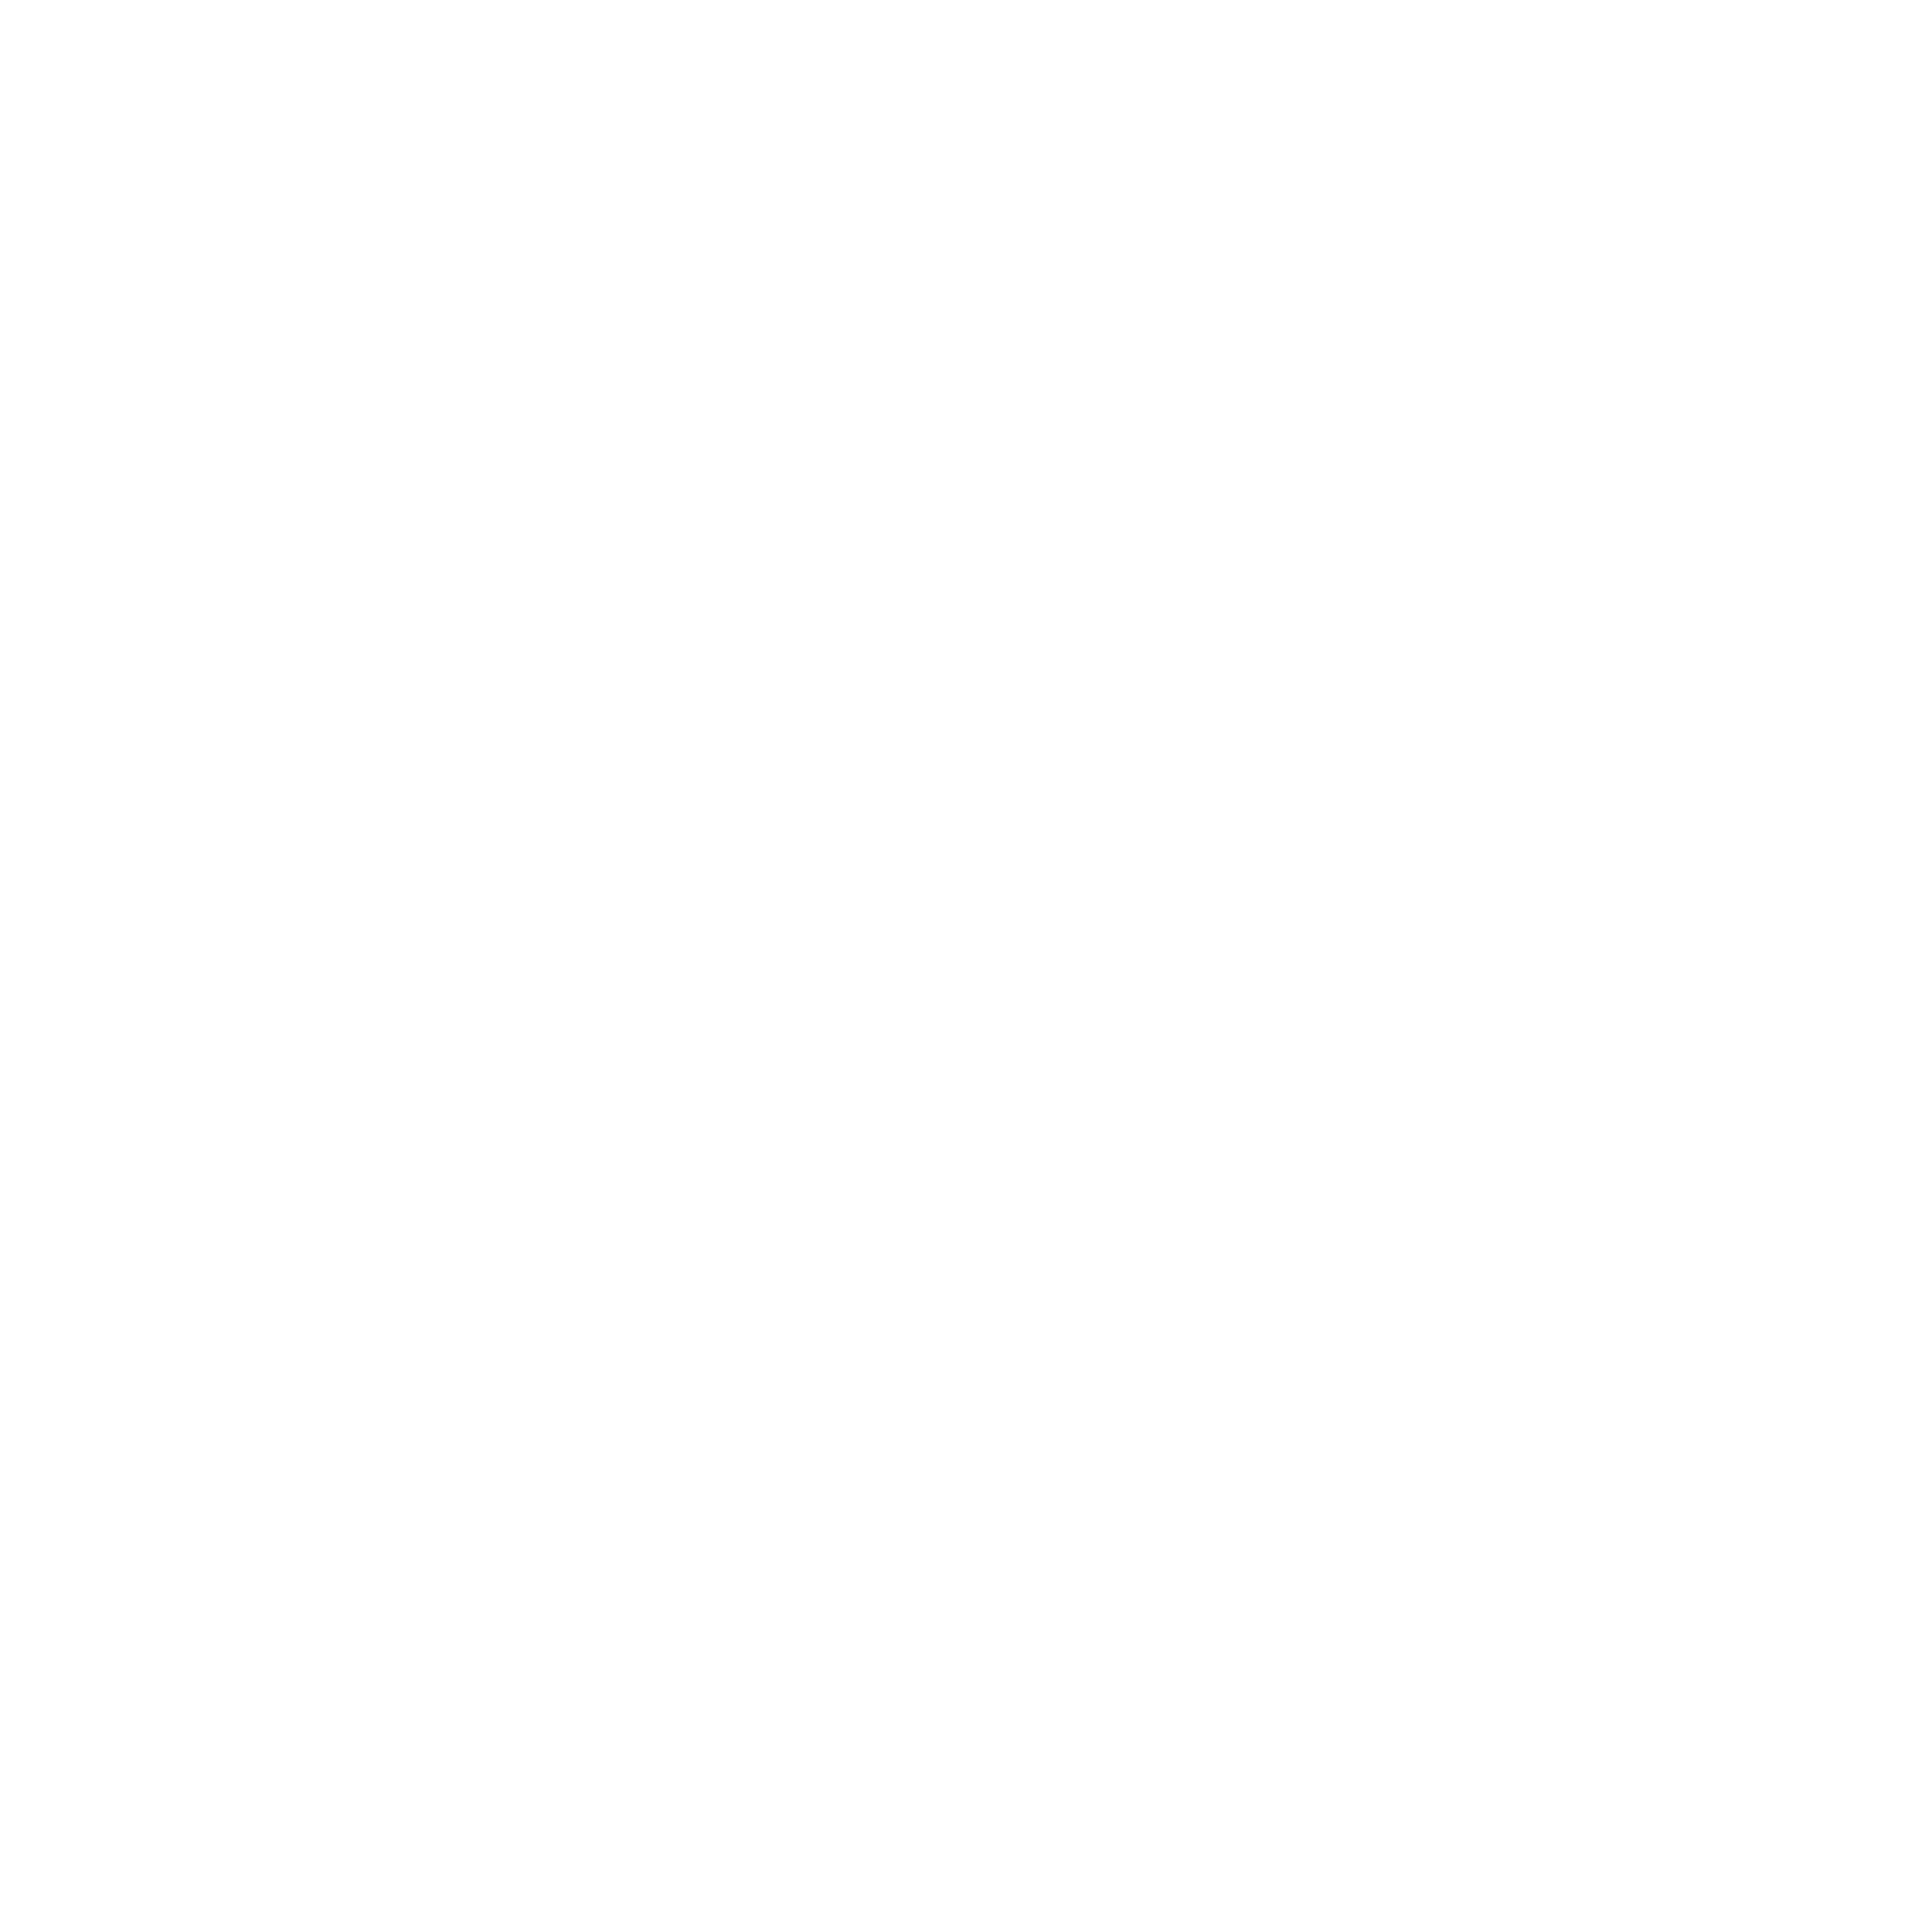 Pico Taqueria logo